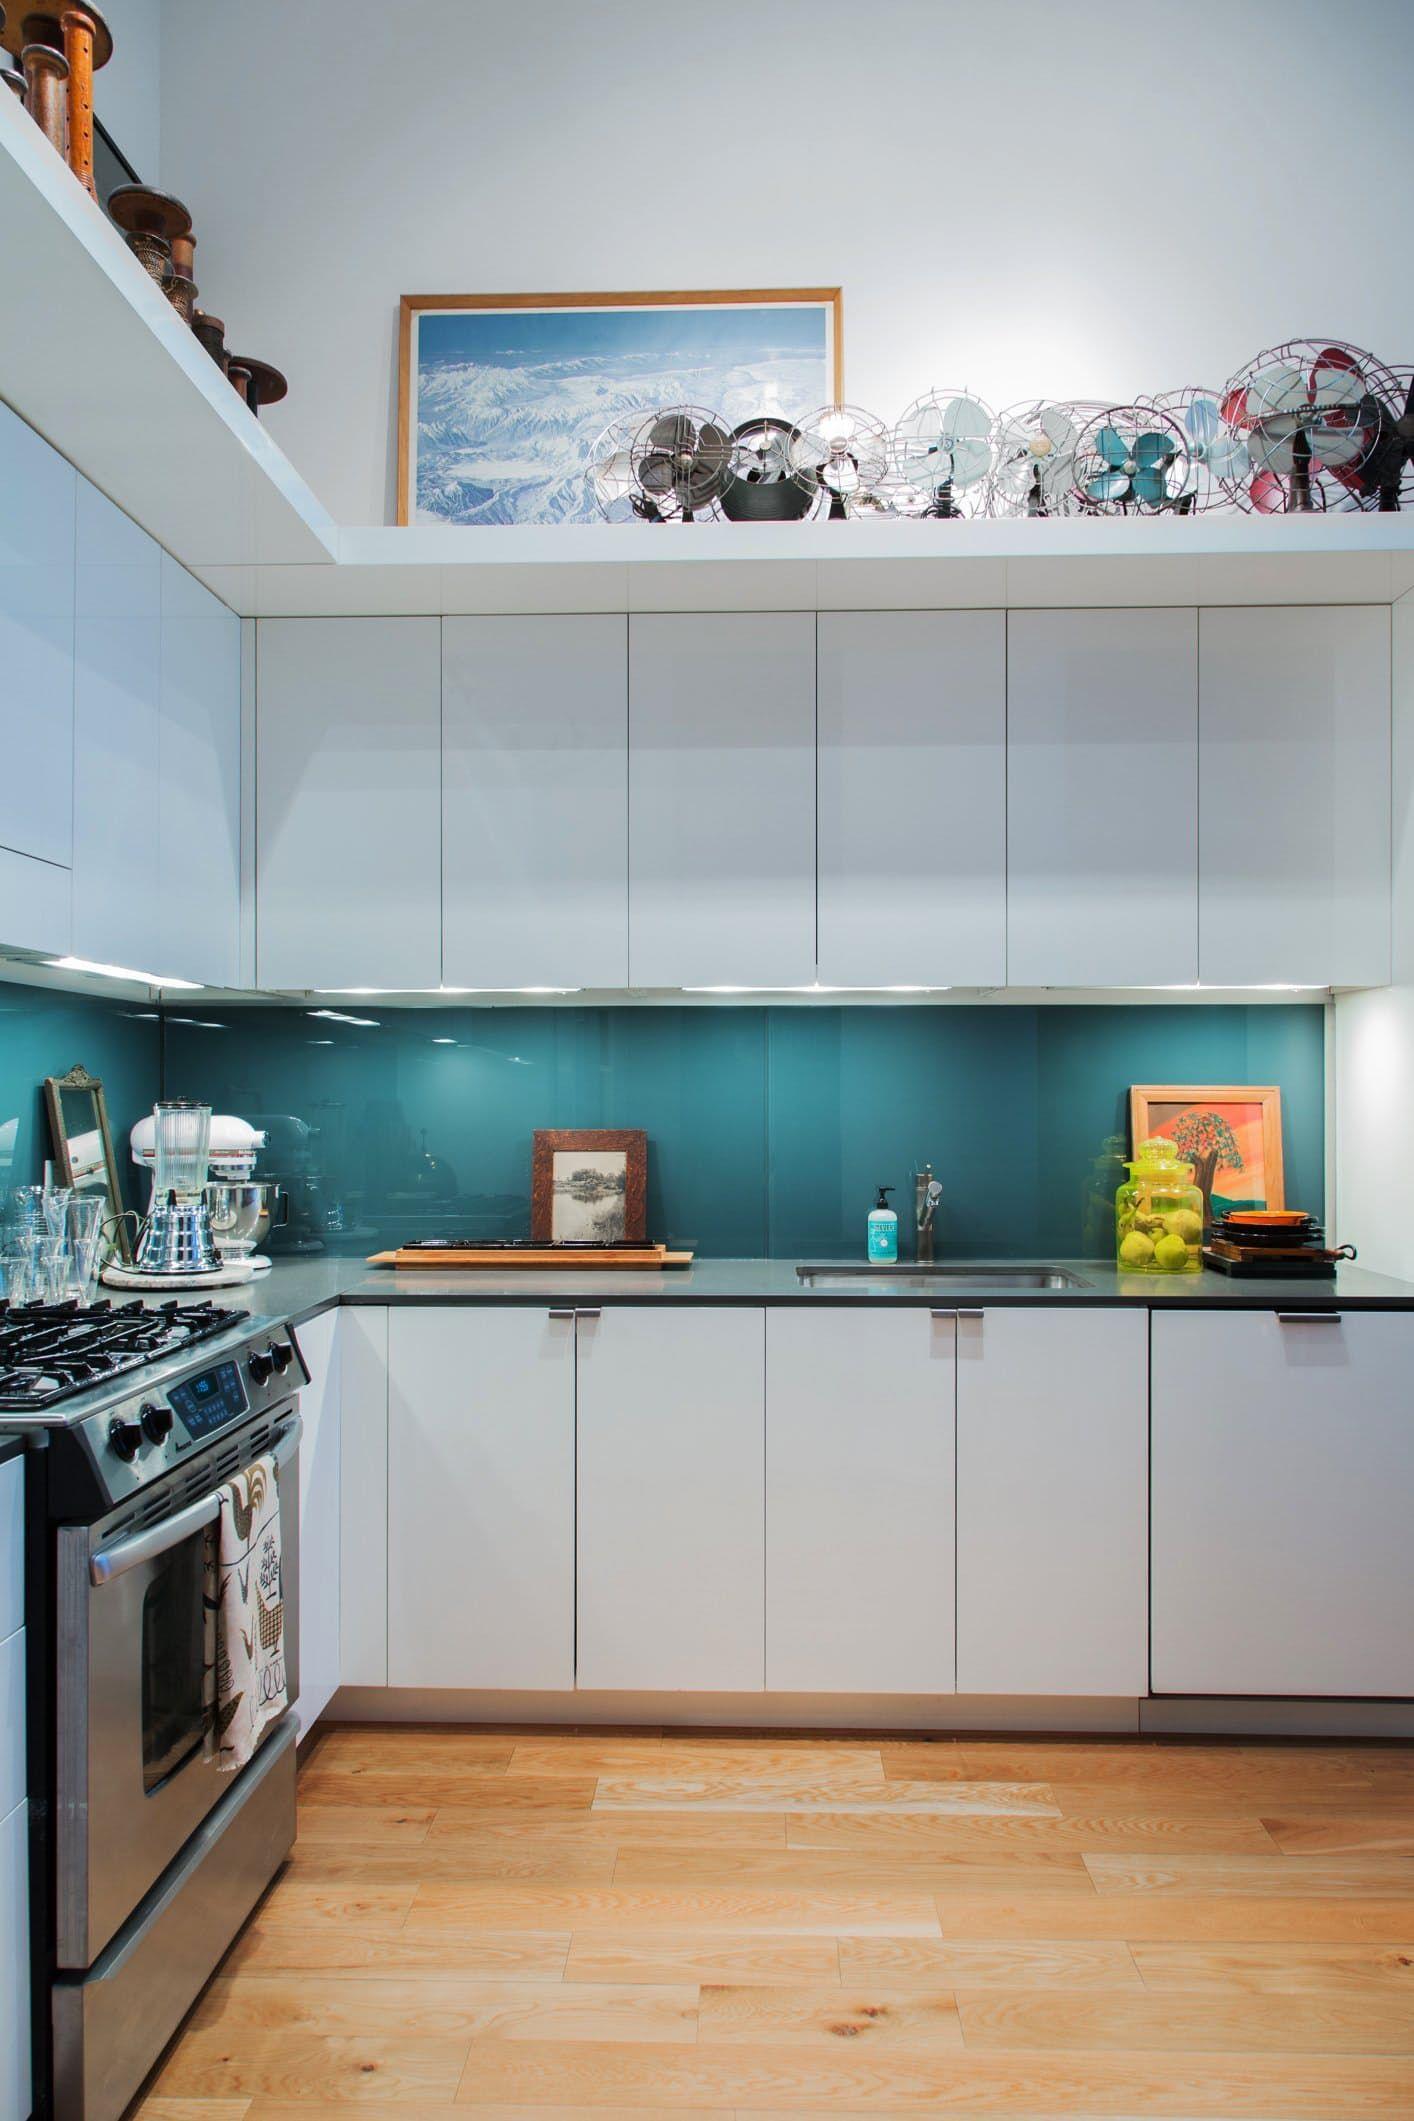 Not Your Basic Backsplash A Lovely Low Maintenance Alternative To Tile Kitchen Design Glass Kitchen Blue Backsplash